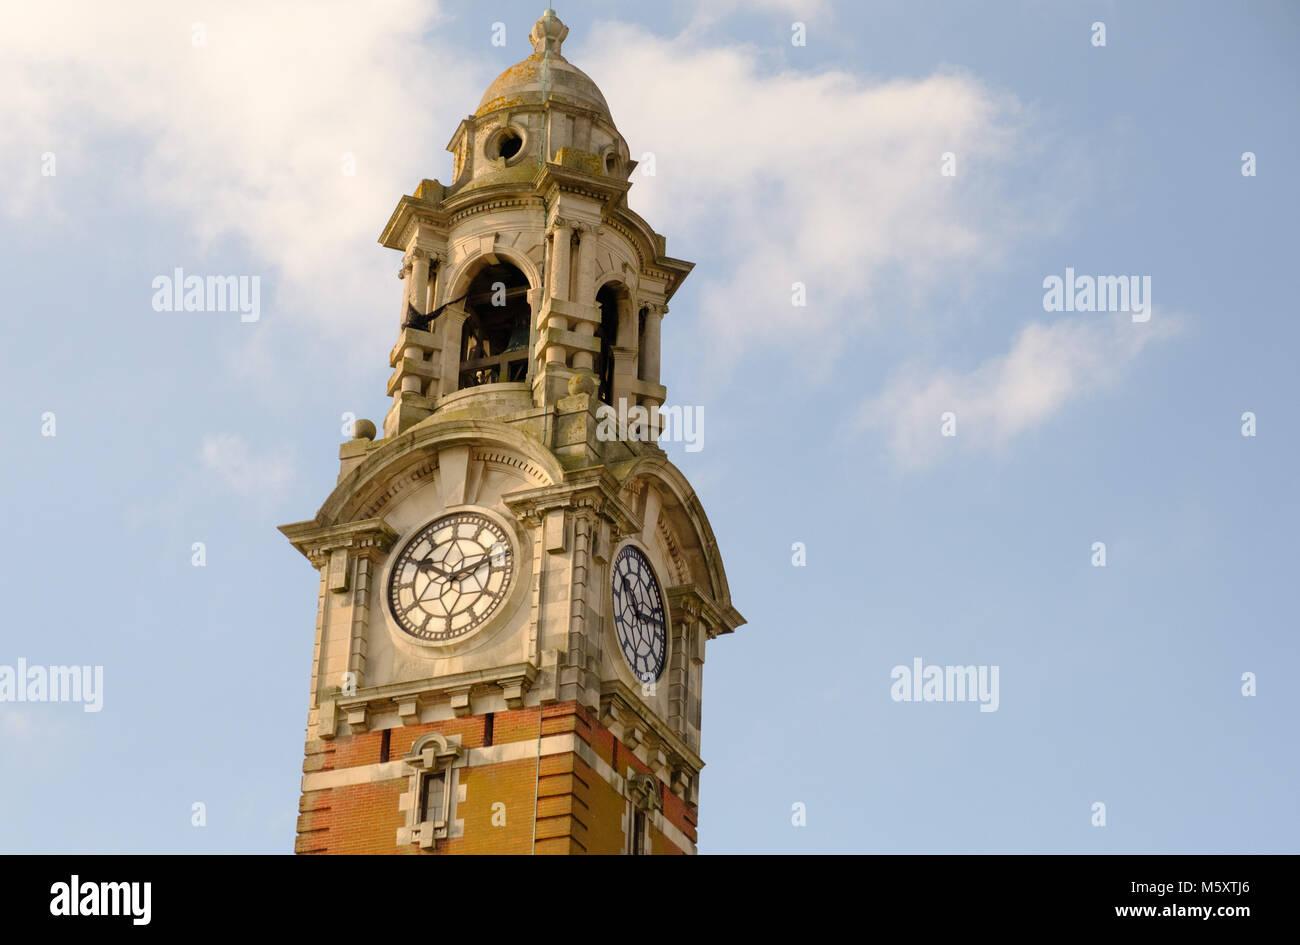 Clock Tower - Stock Image